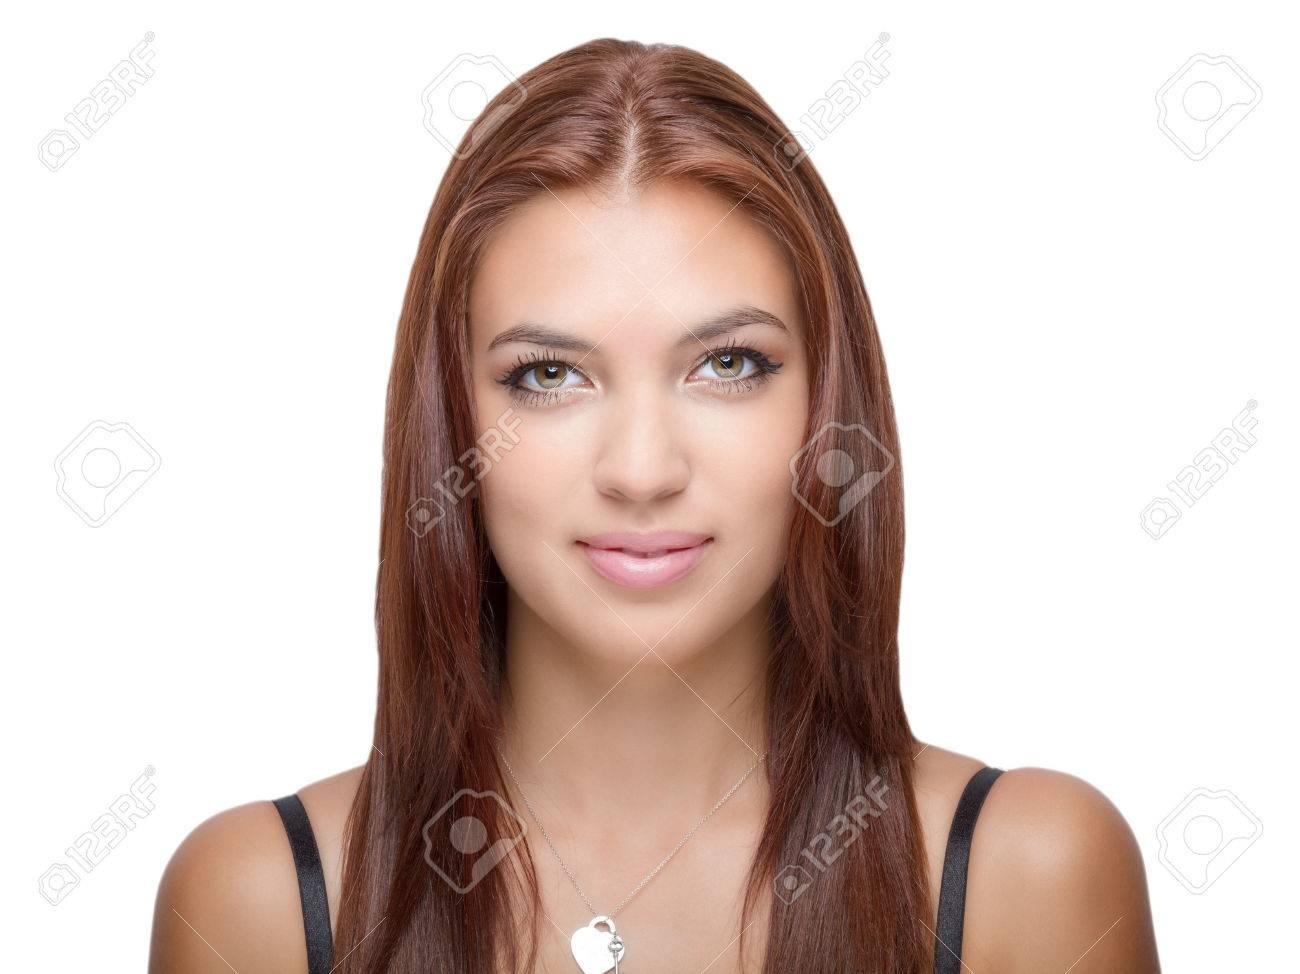 Female With Auburn Hair Hazel Eyes Looks Ahead Smiling Stock Photo